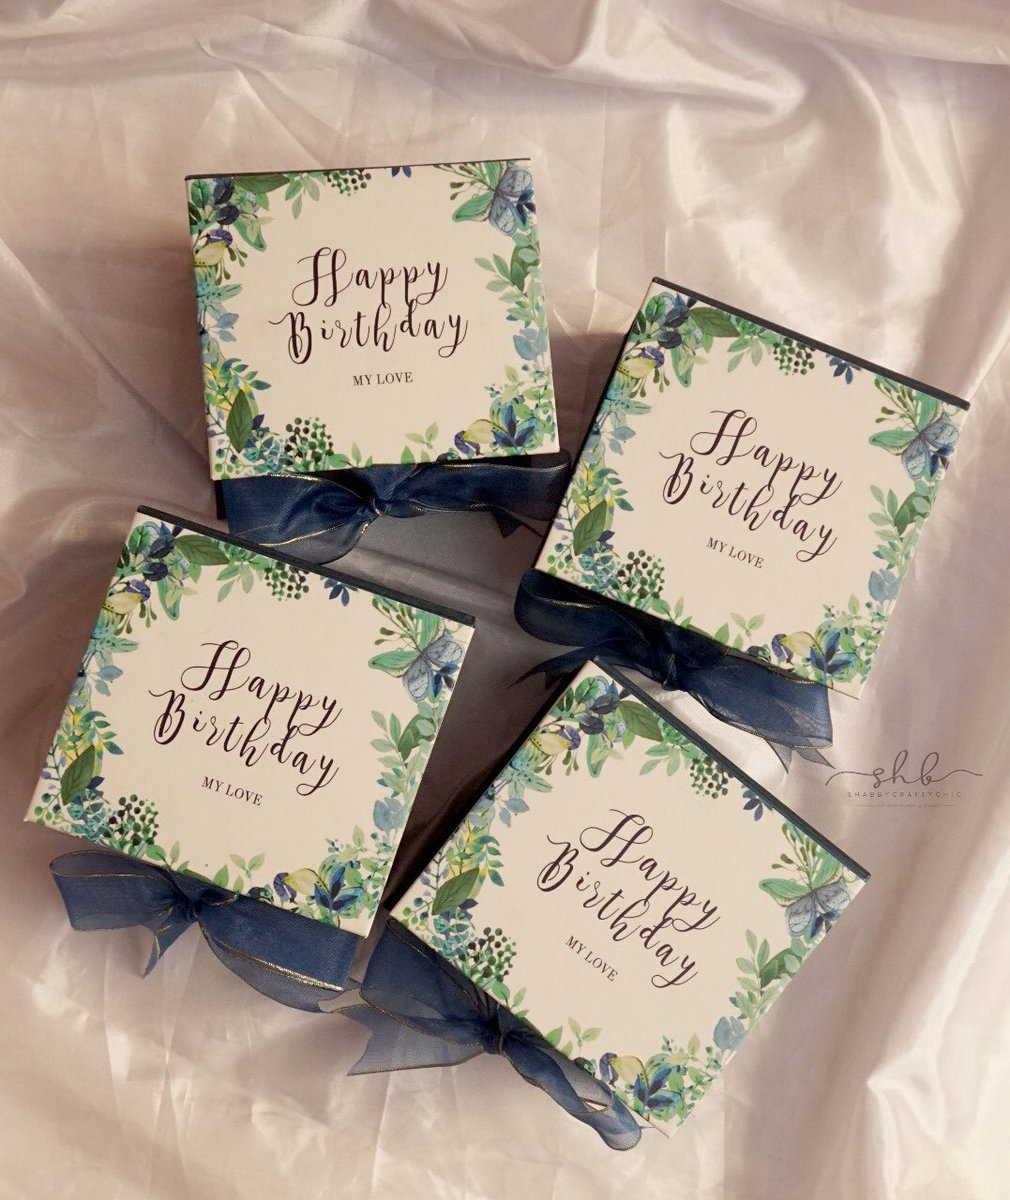 Ready stock 10*10*7cm  55k Material: cartonboard 30, cover artpaper doff, jasmine paper pengiriman sudah dengan bubblewrap  Pemesanan via: wa: 081320776934  #kotakkado #kotakkadobandung #box #gift #custombox #hampers #packaging #cookiesbox  #kemasan #custompackaging #exclusiveboxpic.twitter.com/3TeY4QS2ZP